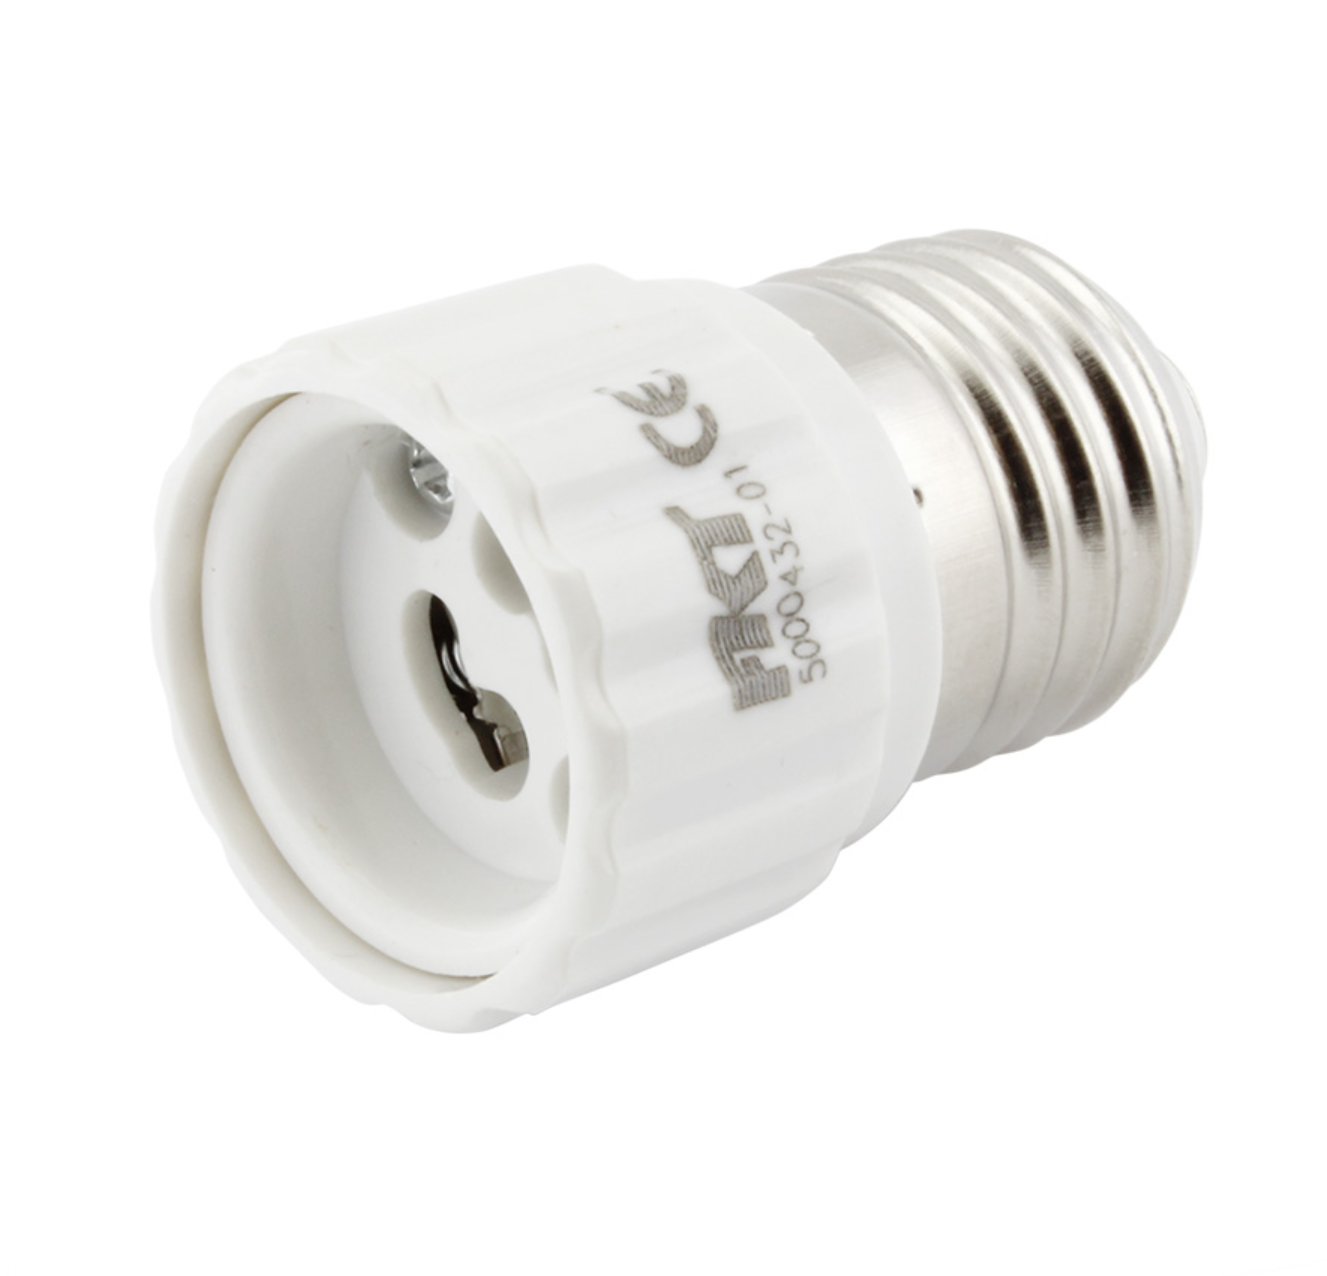 Adaptér pro LED žárovky E27 na GU10 (5000432)